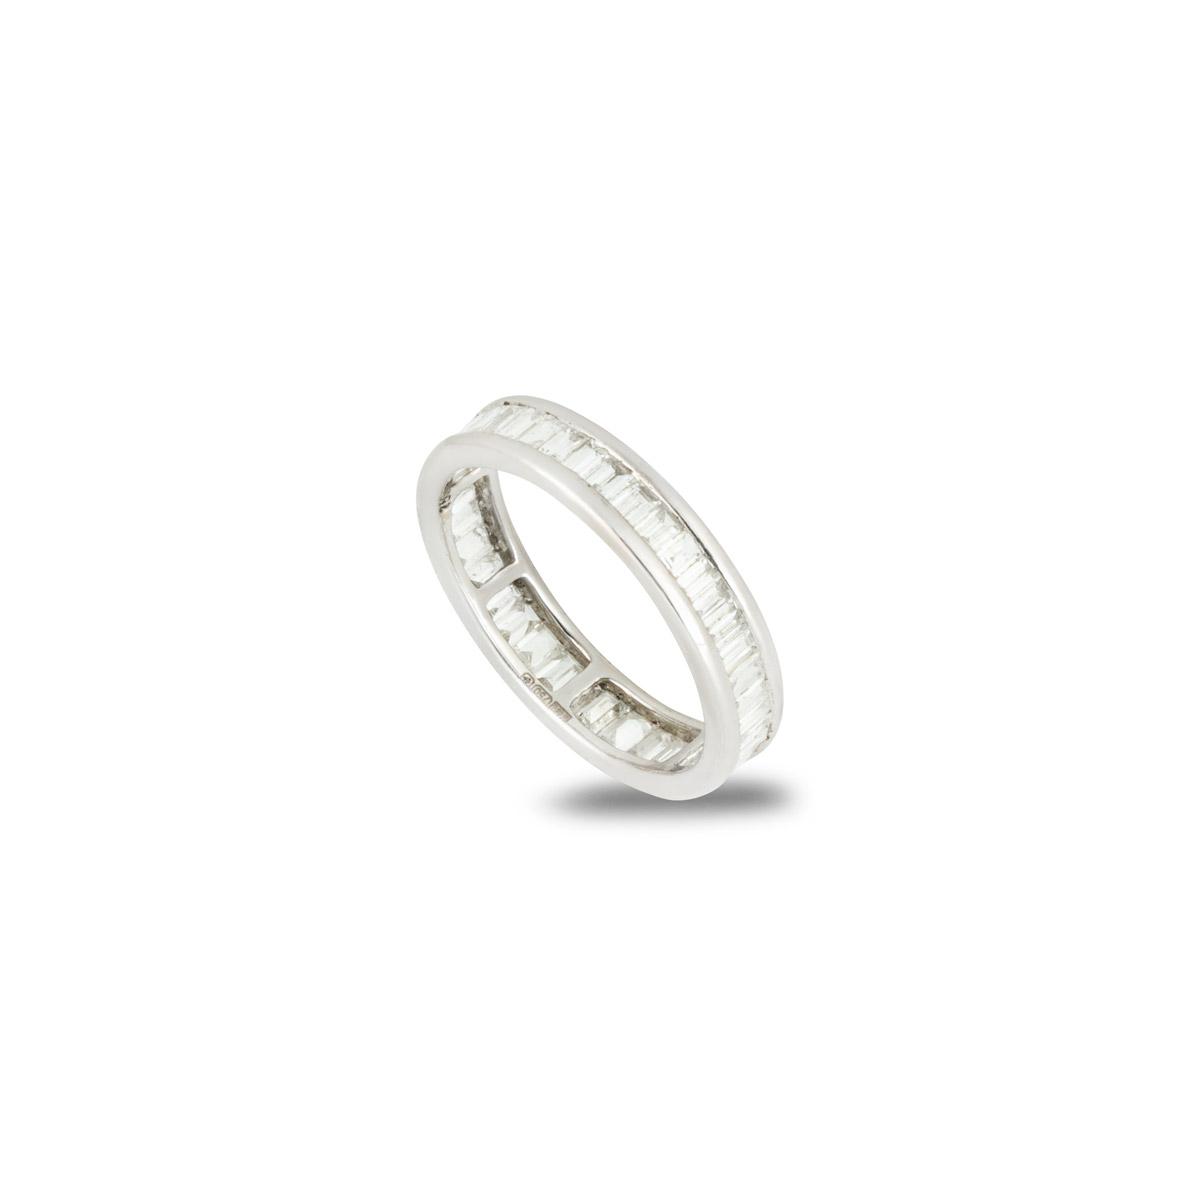 18k White Gold Baguette Cut Diamond Eternity Ring 1ct Total